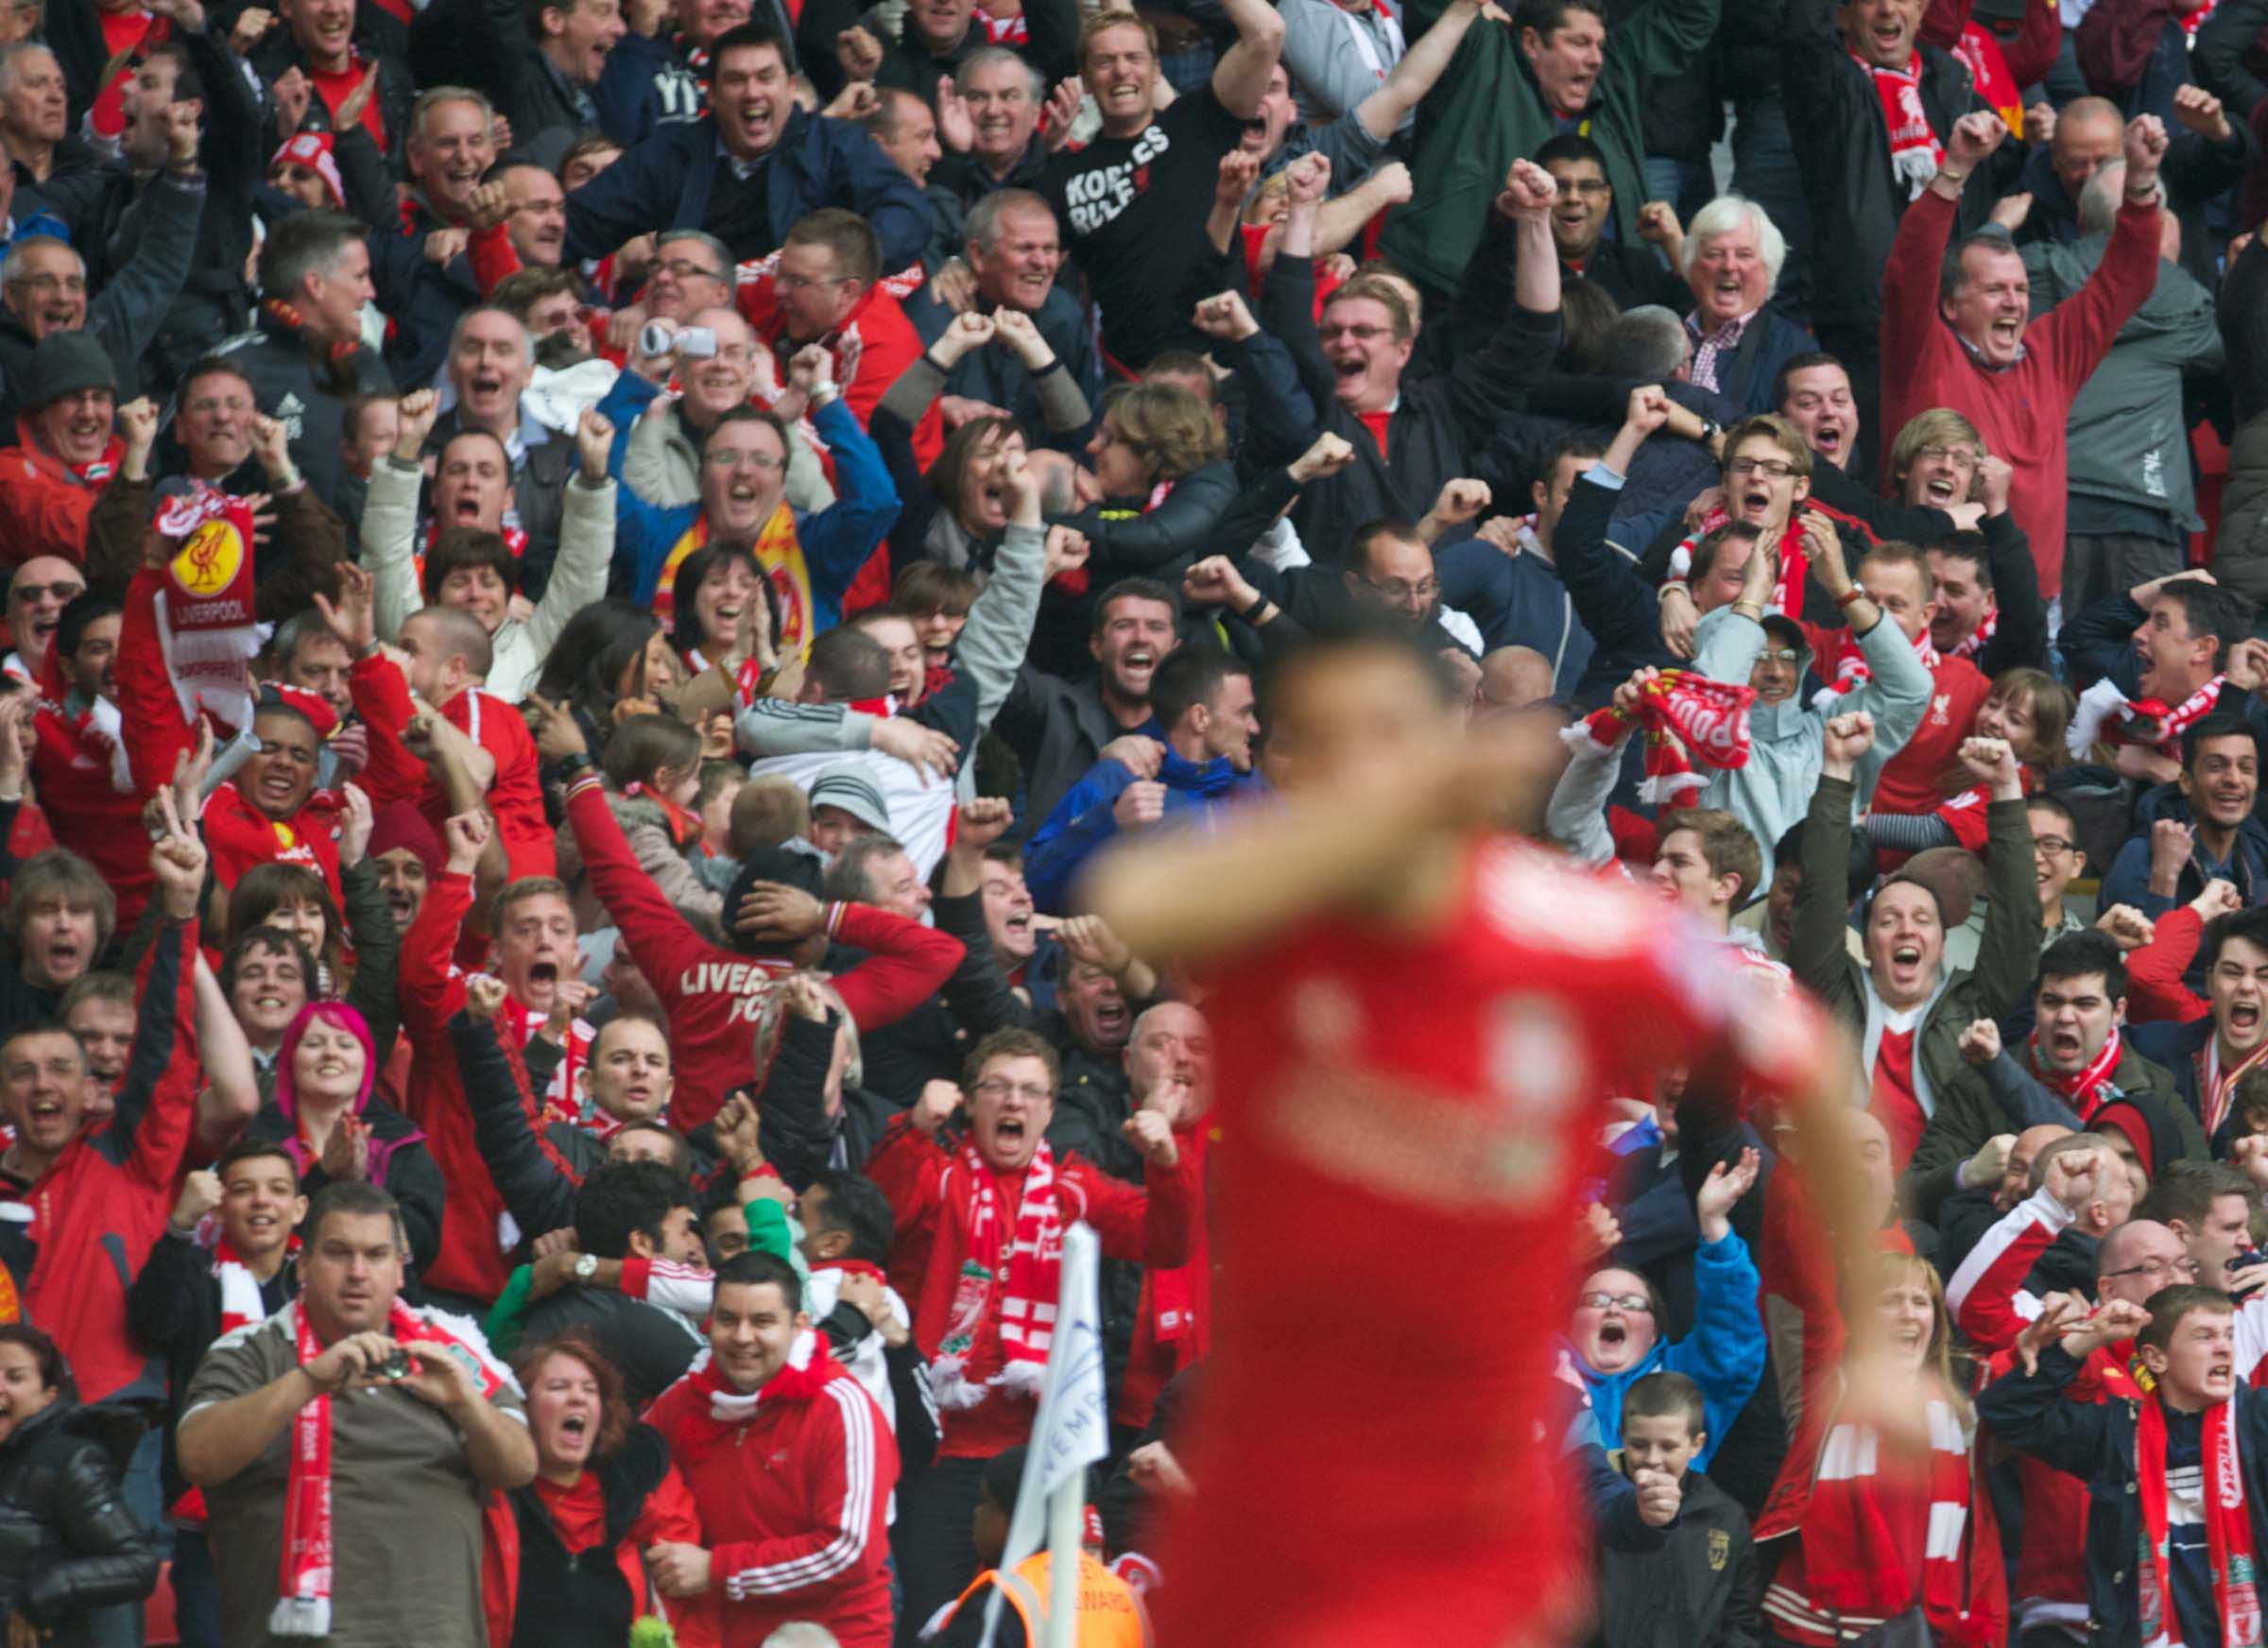 Football - FA Cup - Semi-Final - Everton FC v Liverpool FC